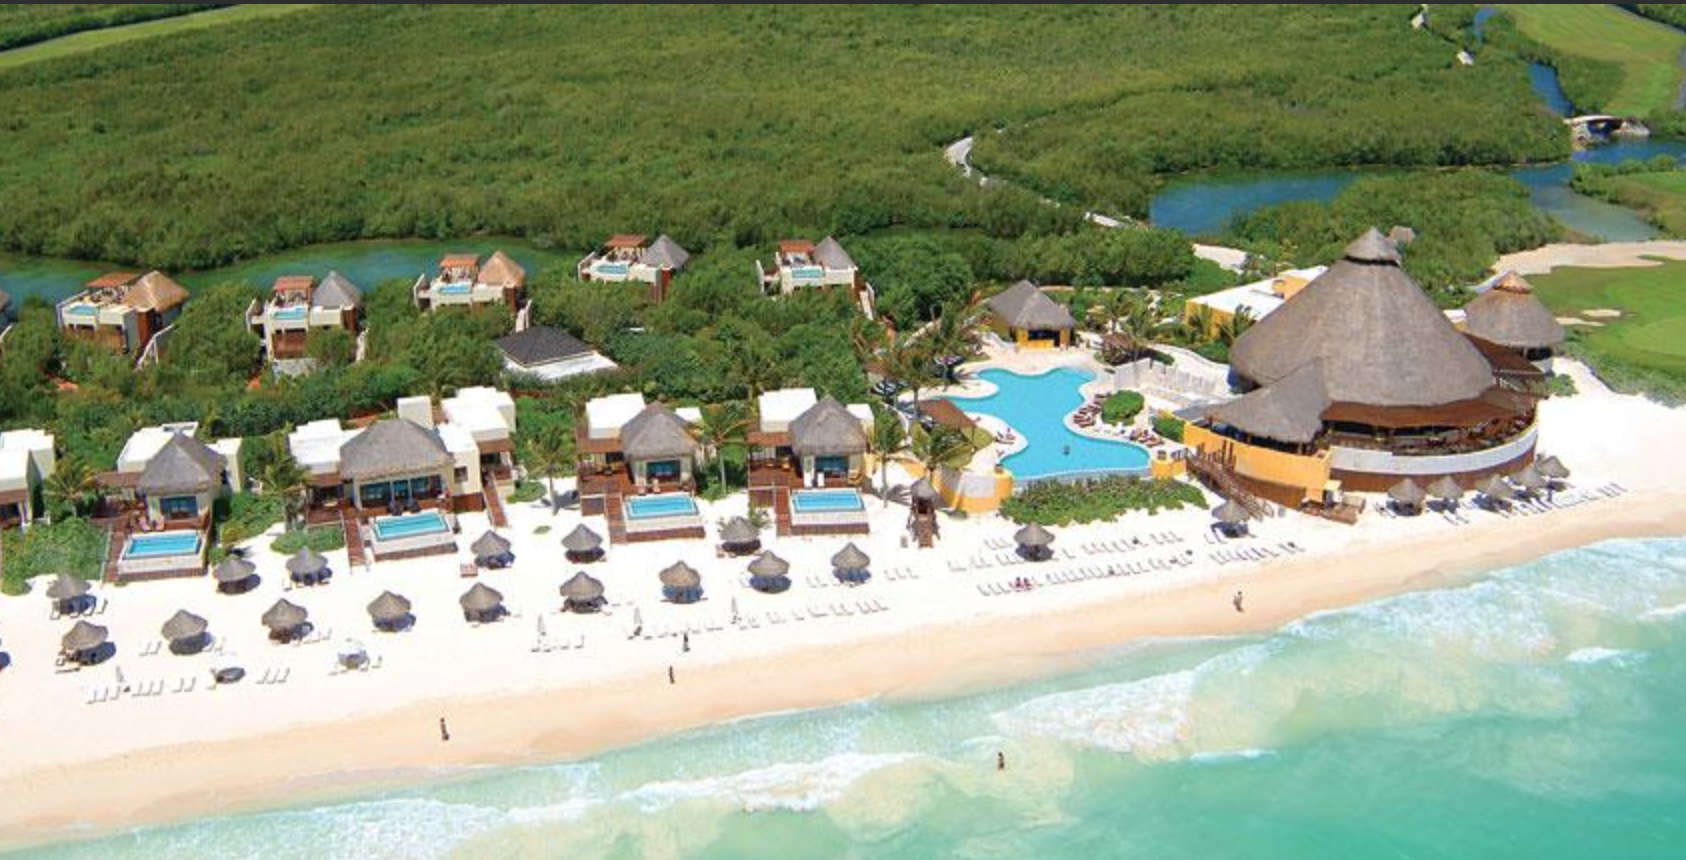 Fairmont Hotel Mayakoba aerial